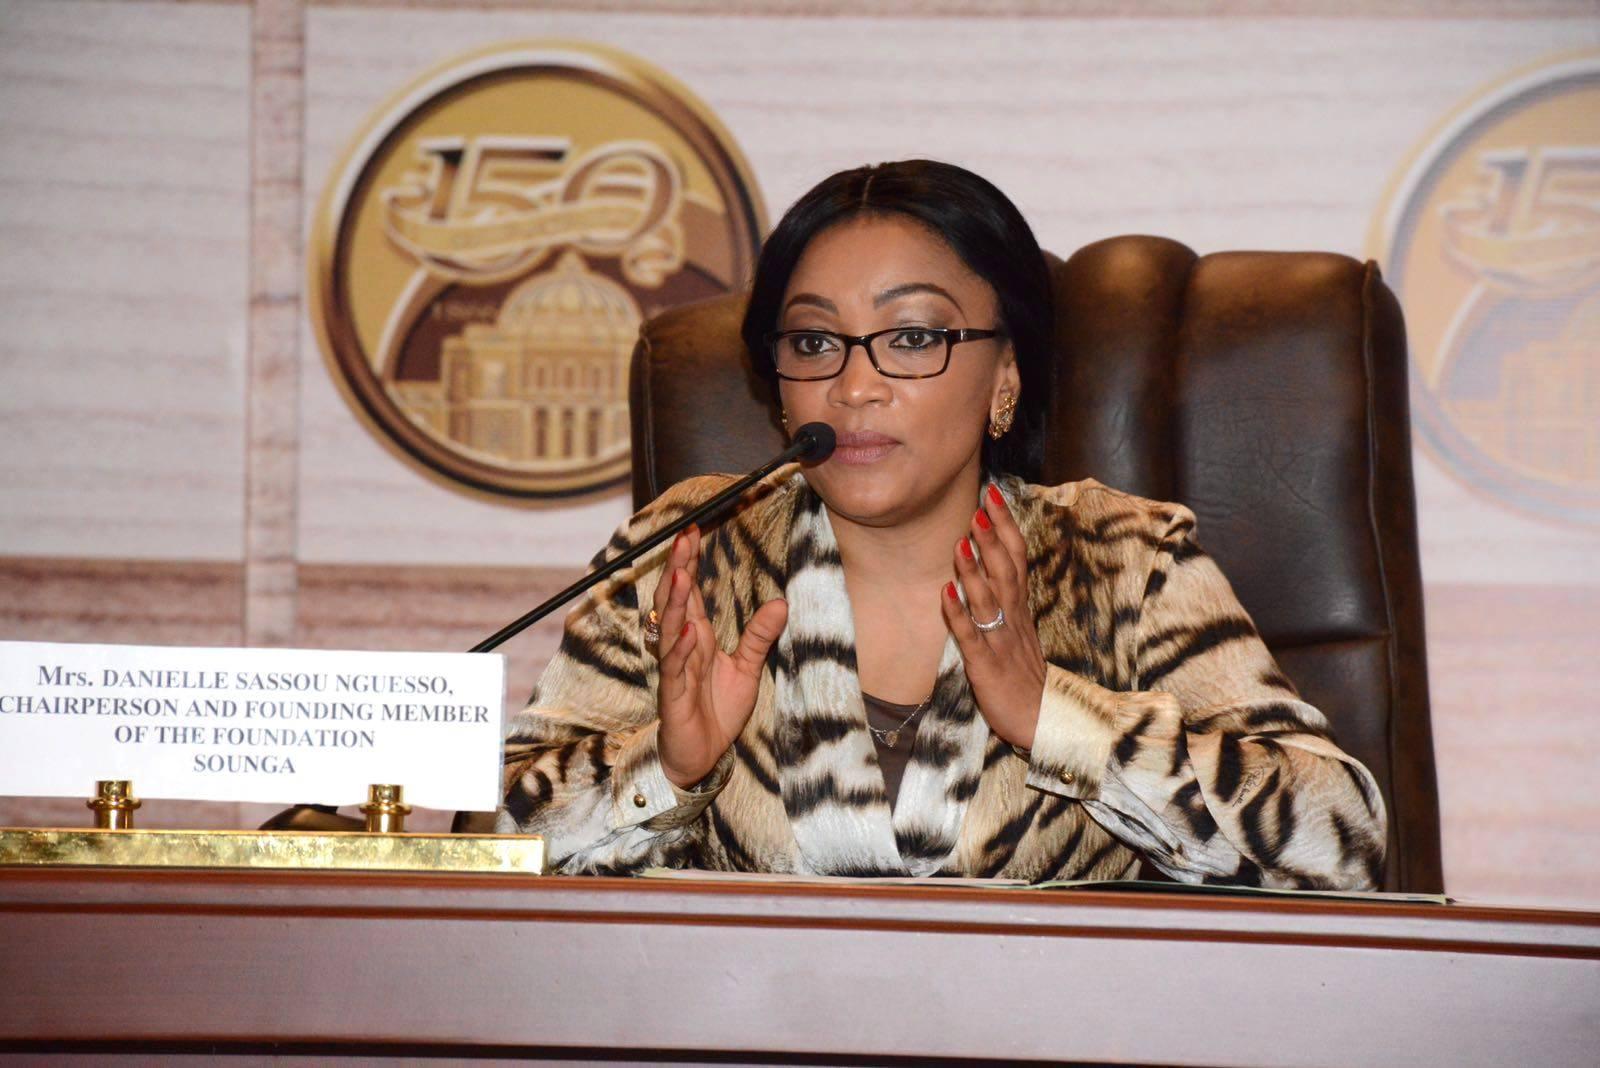 Danièle Sassou Nguesso